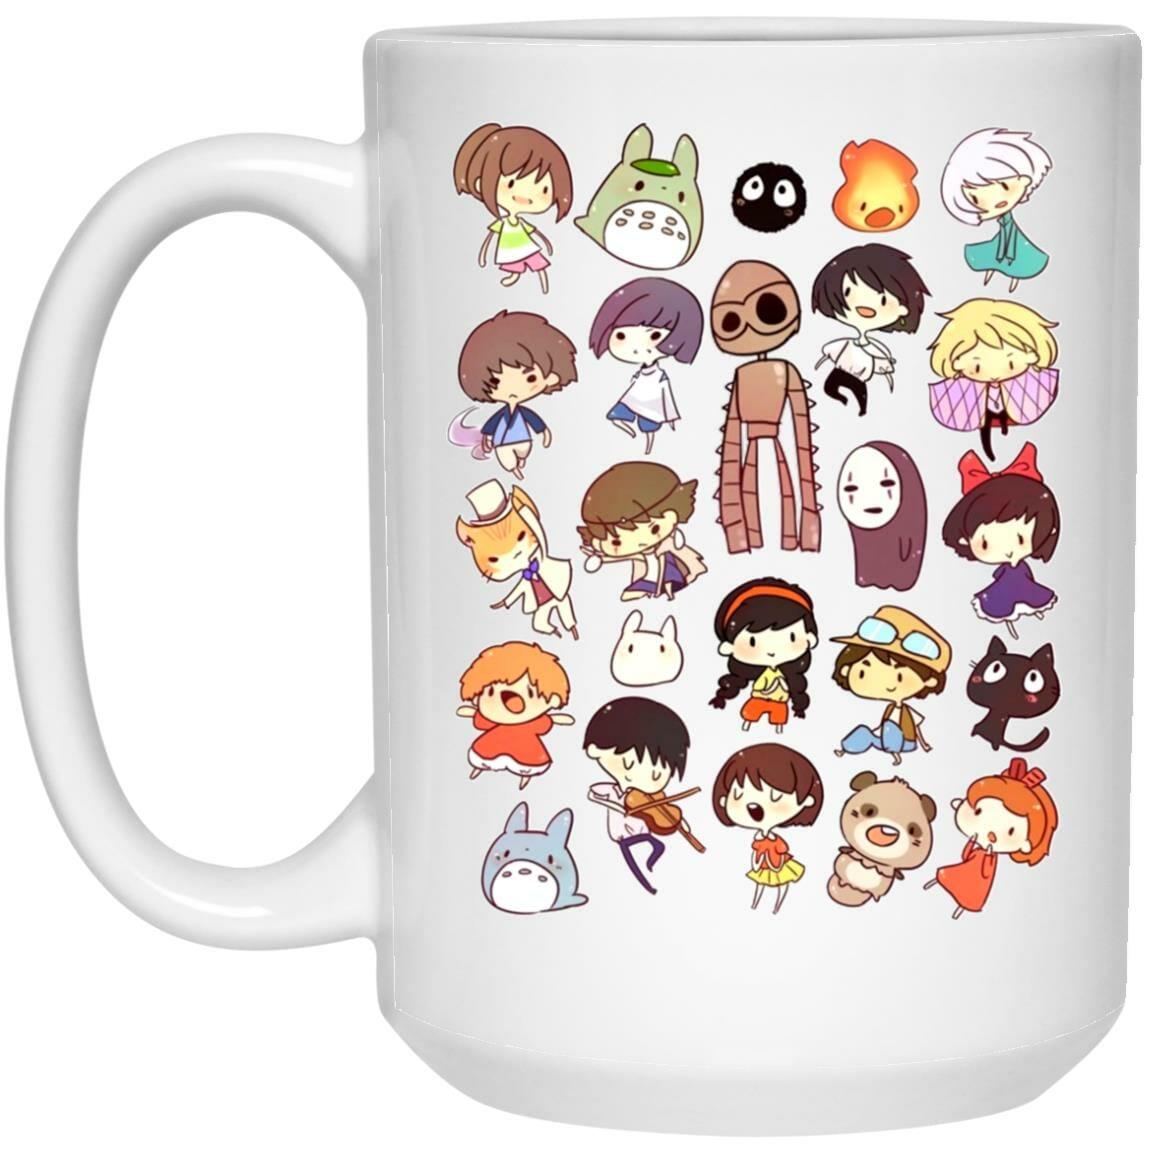 Ghibli Movie Characters Cute Chibi Collection Mug